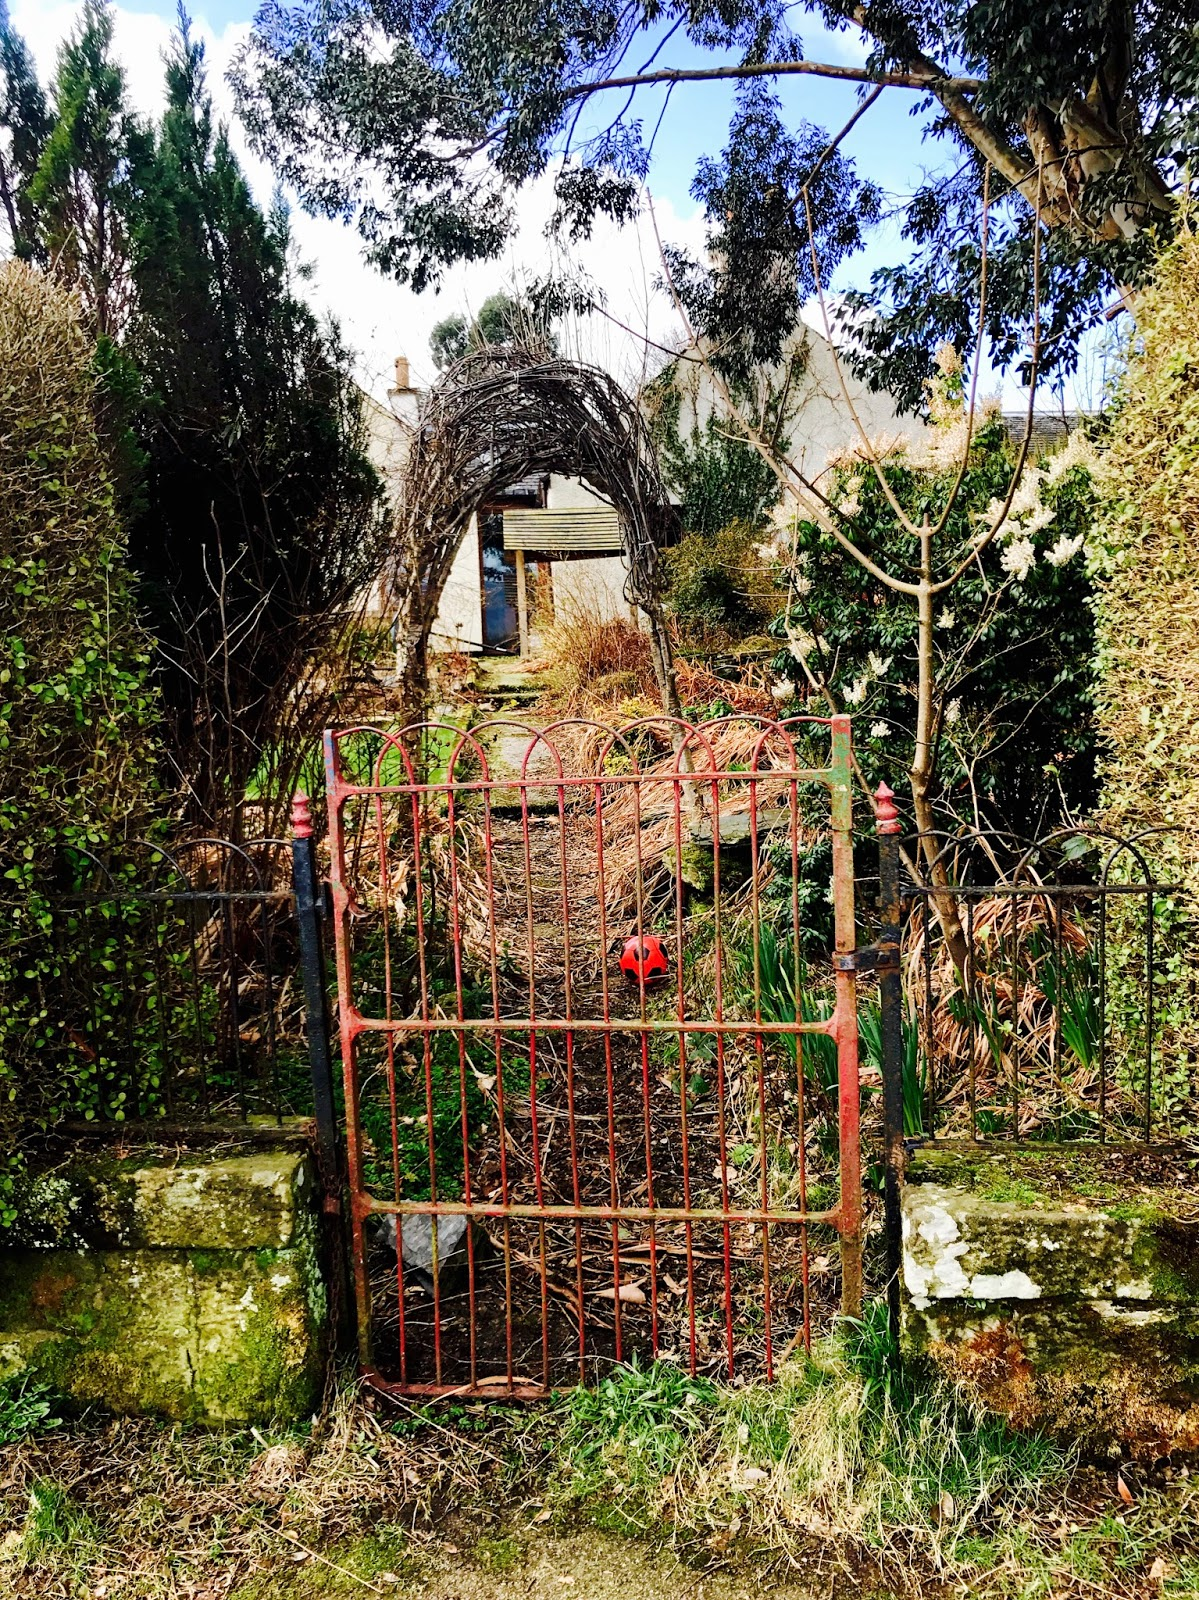 Zone Five and a Half: Garden Gates